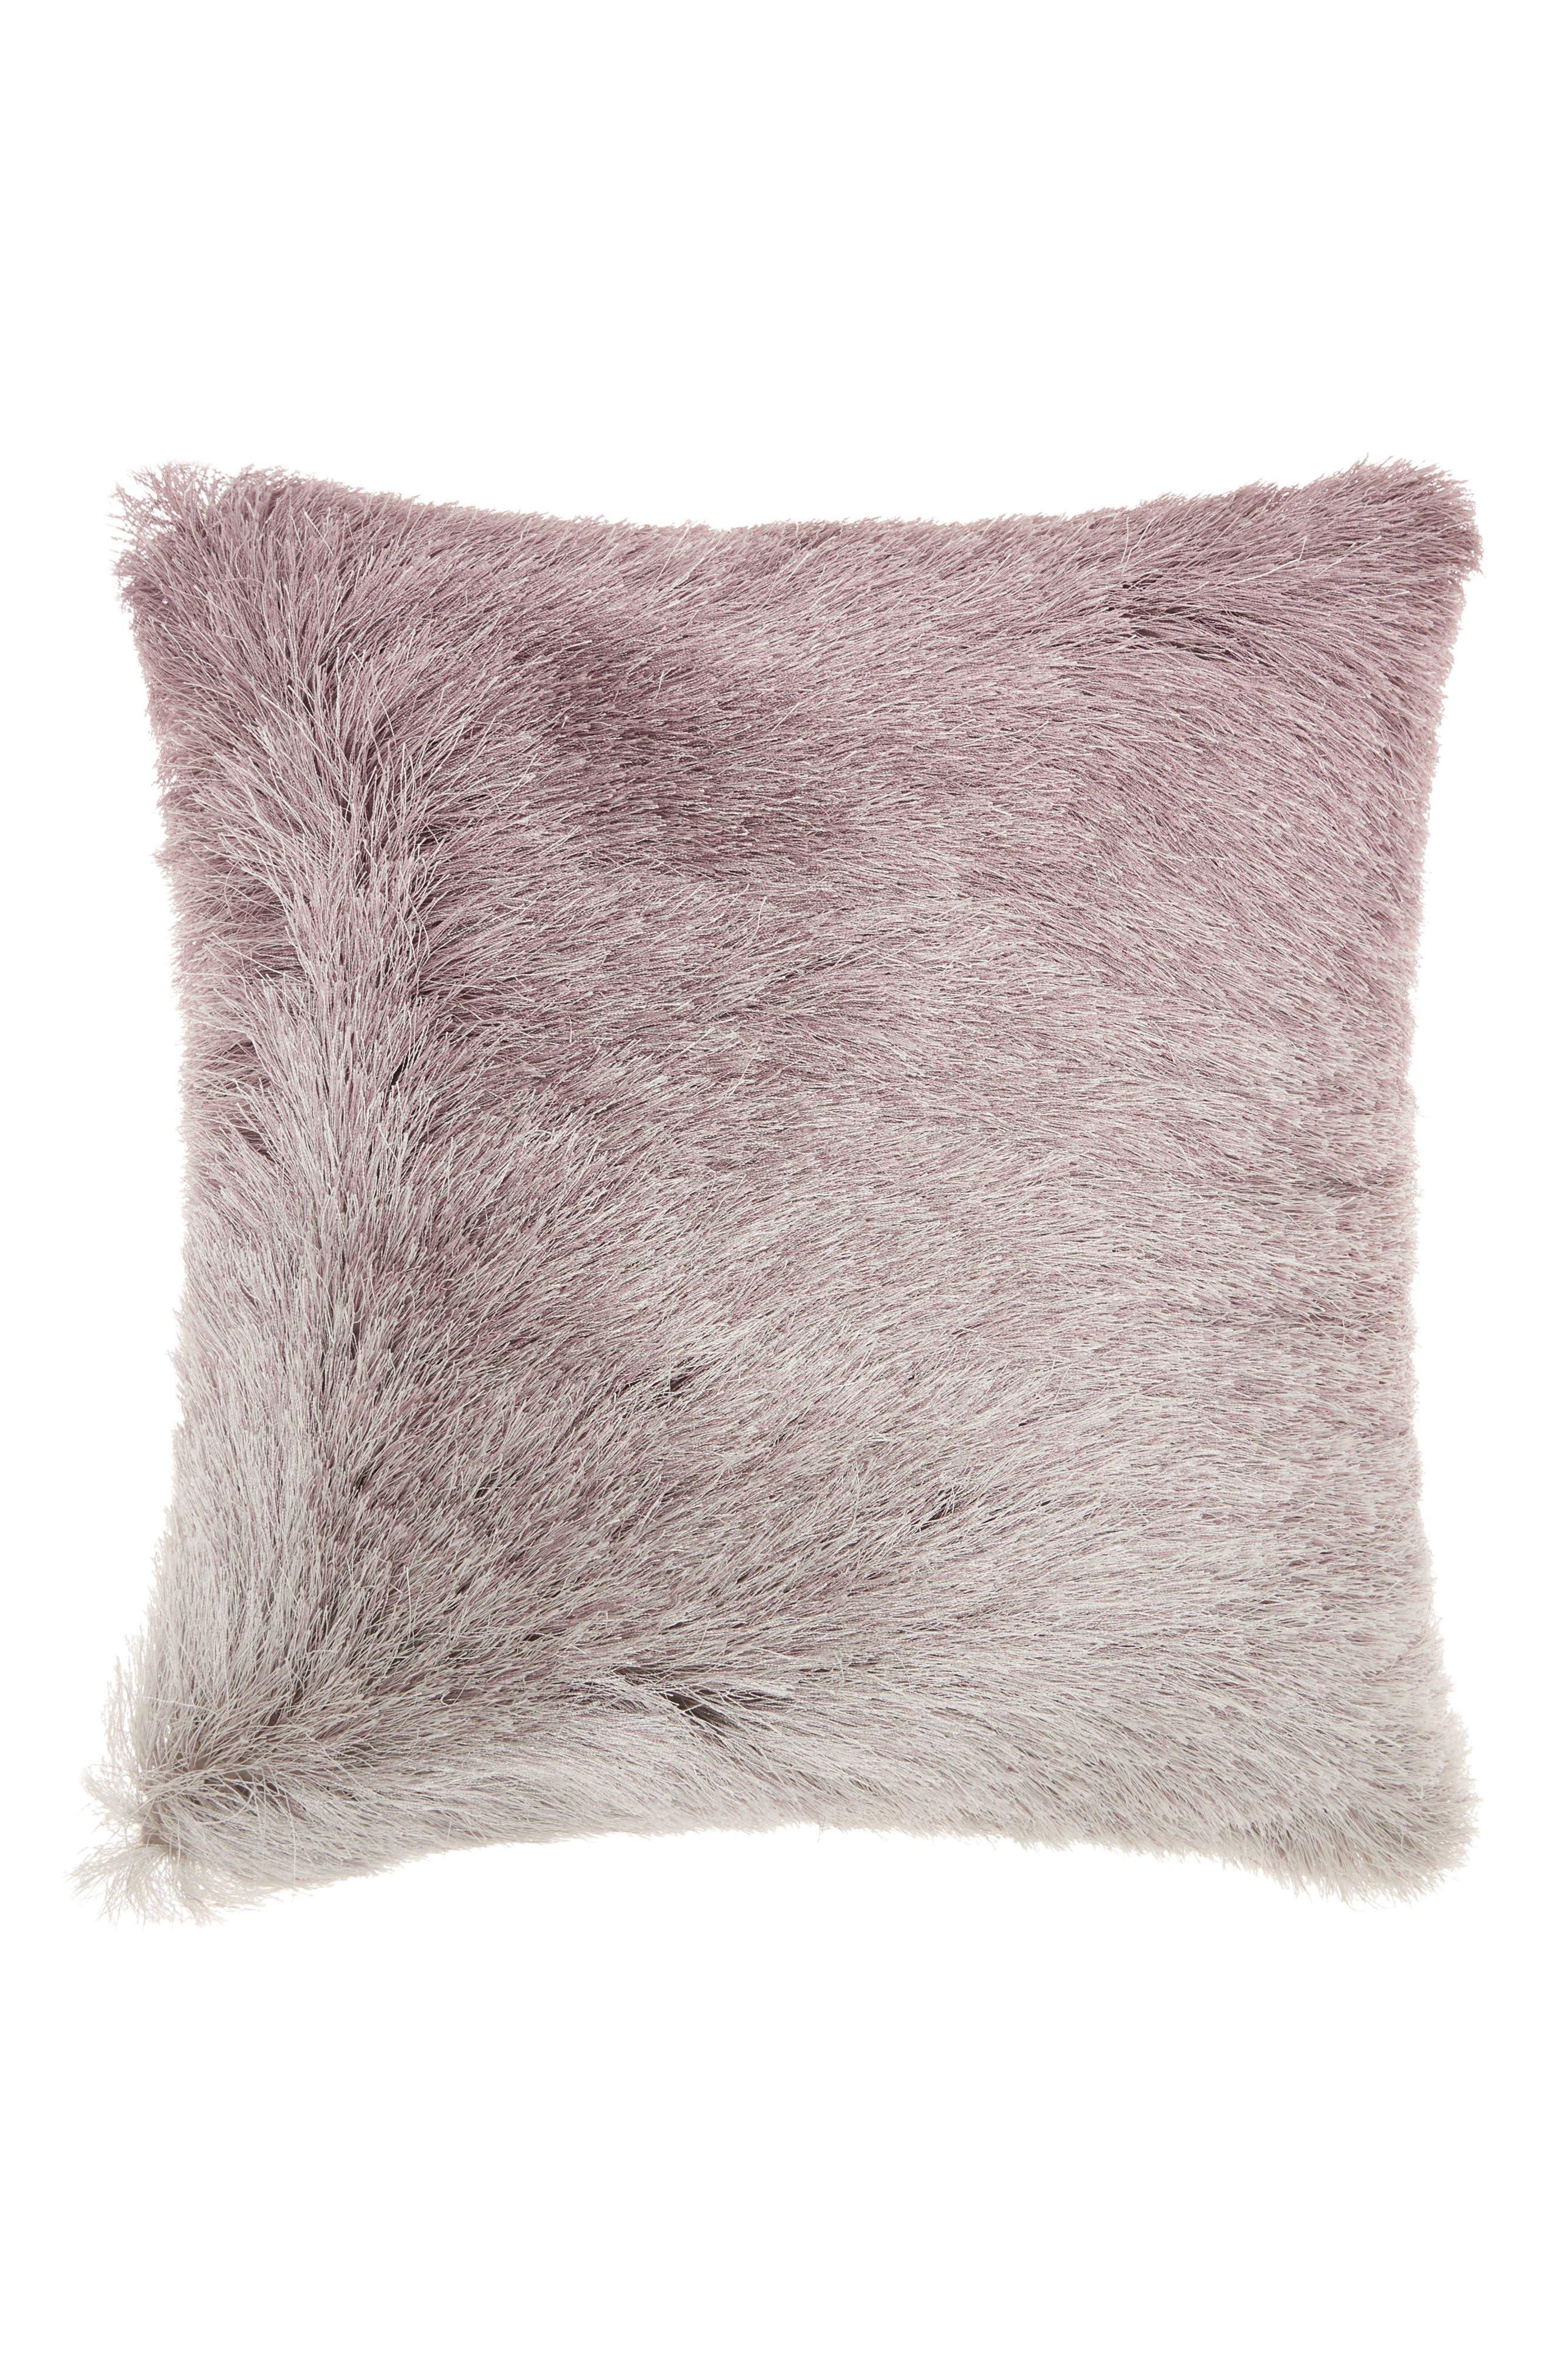 Mina Victory Shag Ombré Pillow